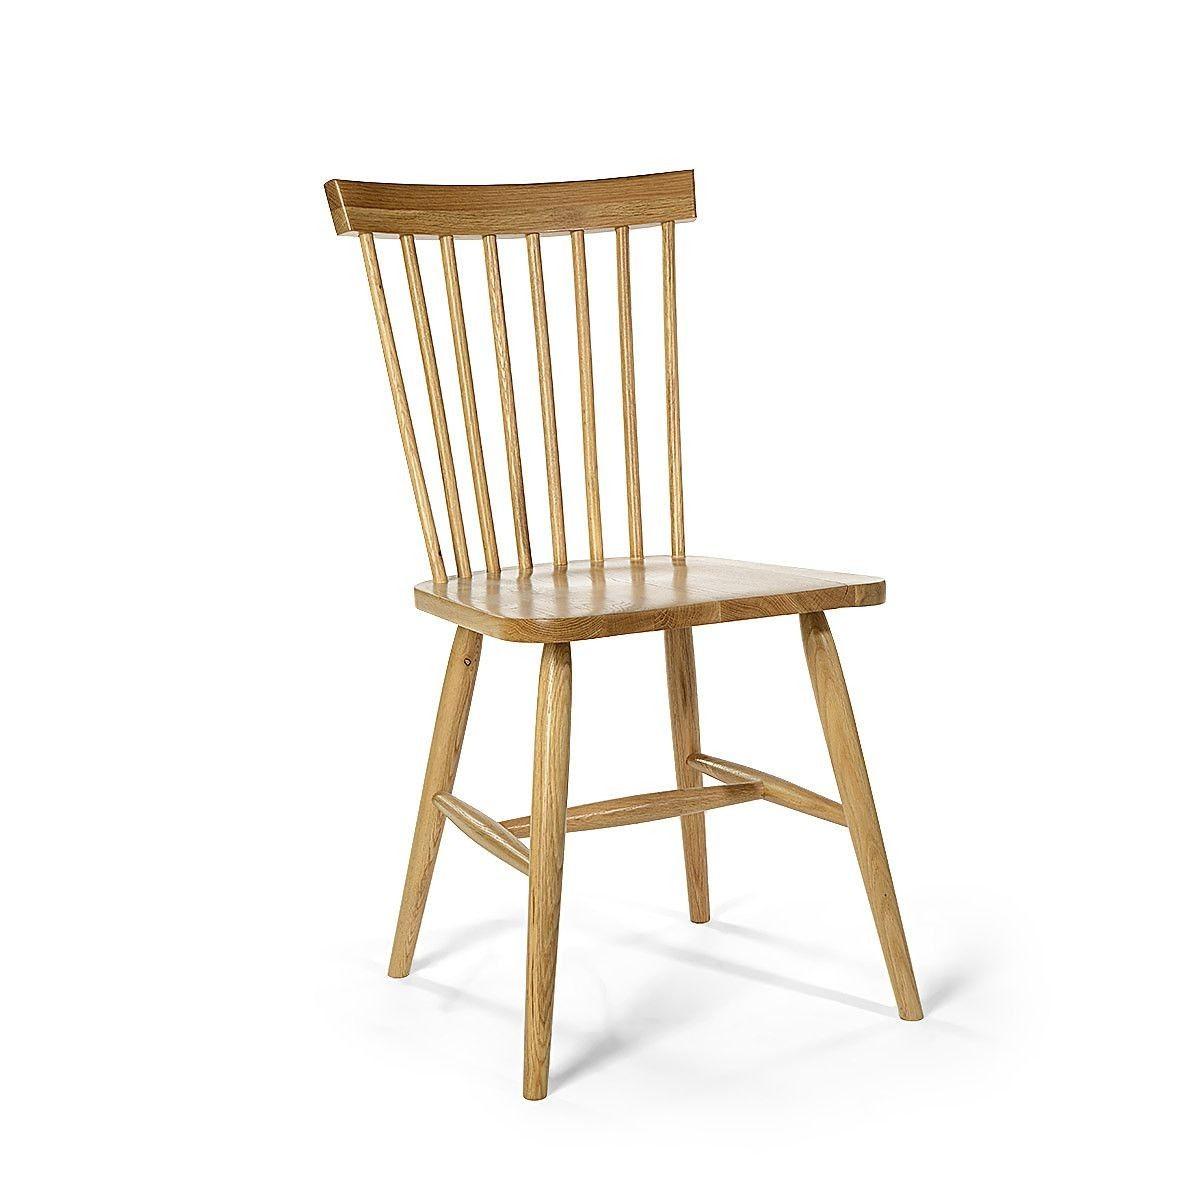 Stühle Designklassiker stuhl drammen holz nordiches design natur holzstuhl skandinav